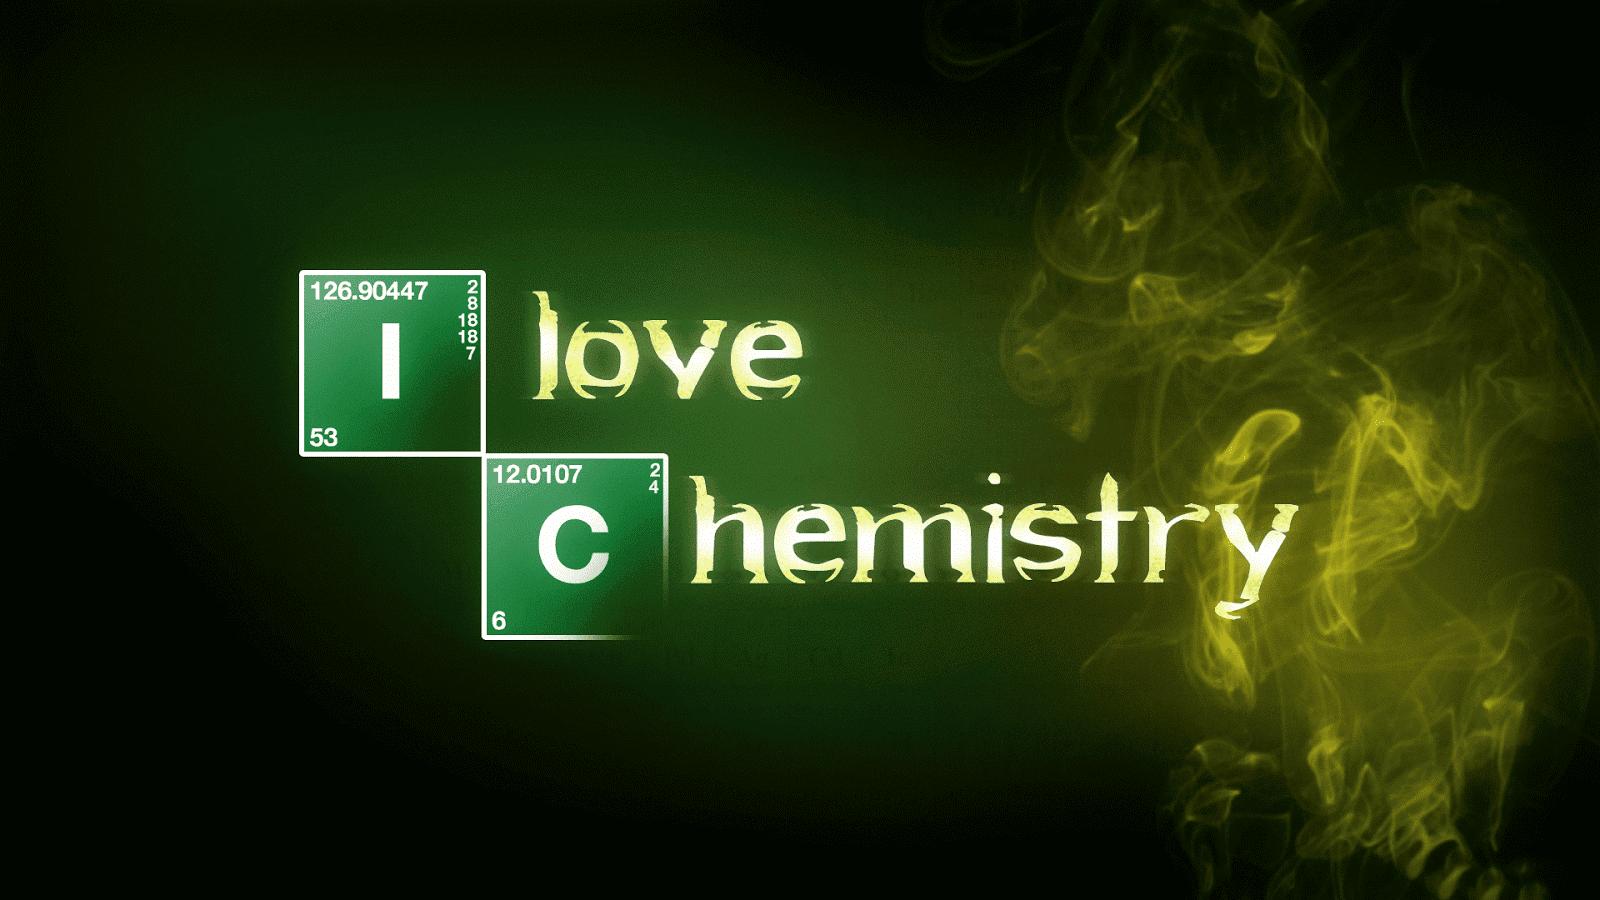 Good Wallpaper High Quality Chemistry - Chemistry%2BImages%2BFree%2BDownload  2018_487795.png